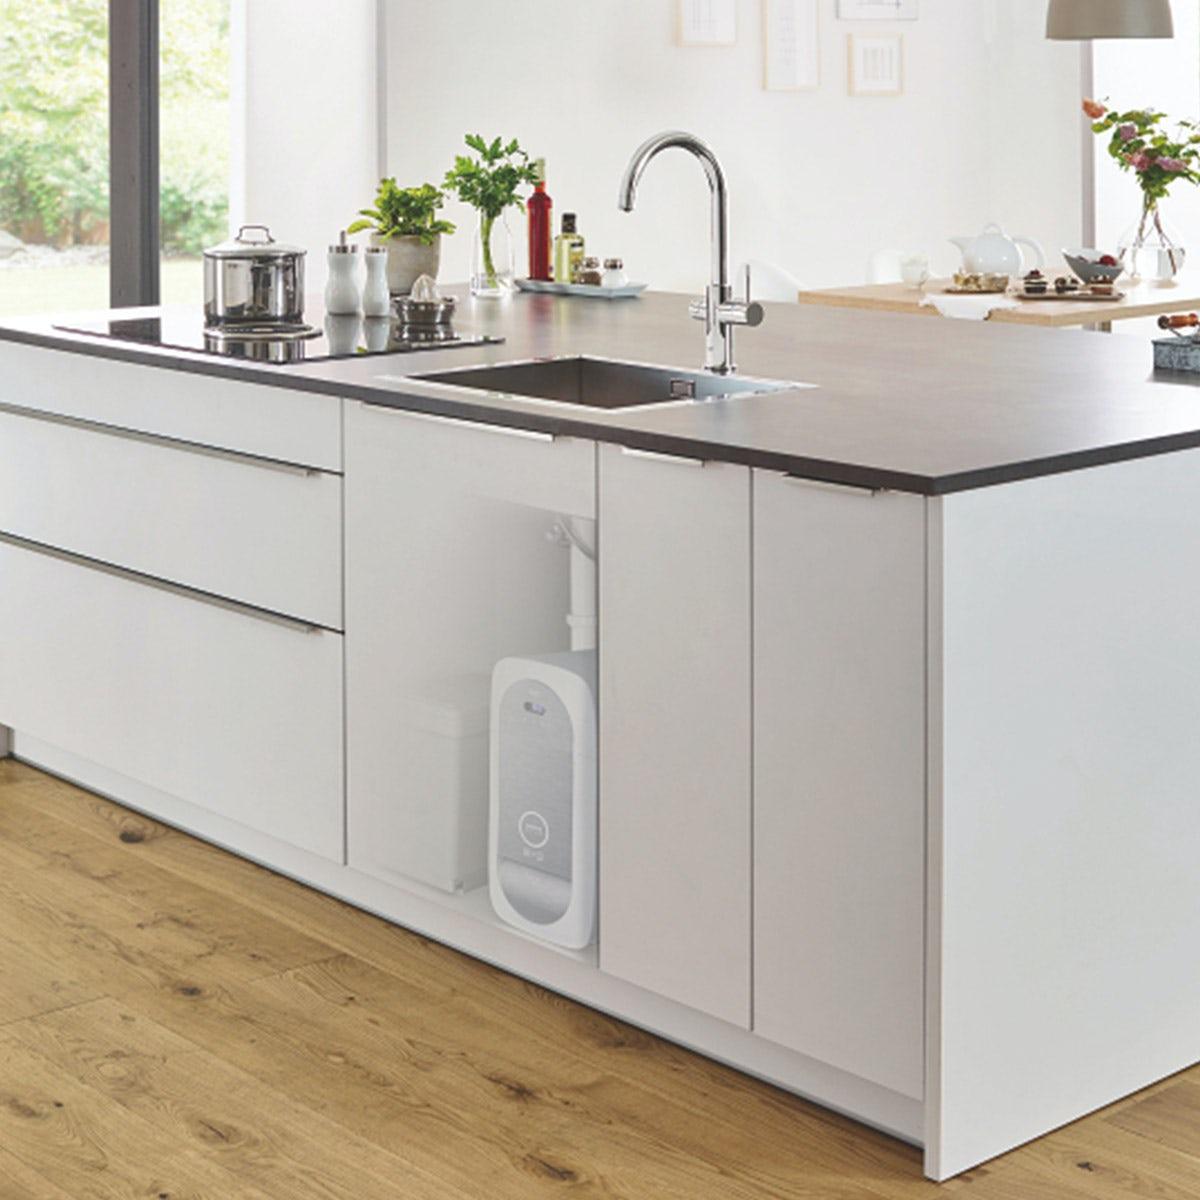 Grohe Blue Alternative grohe blue home c spout kitchen tap victoriaplum com